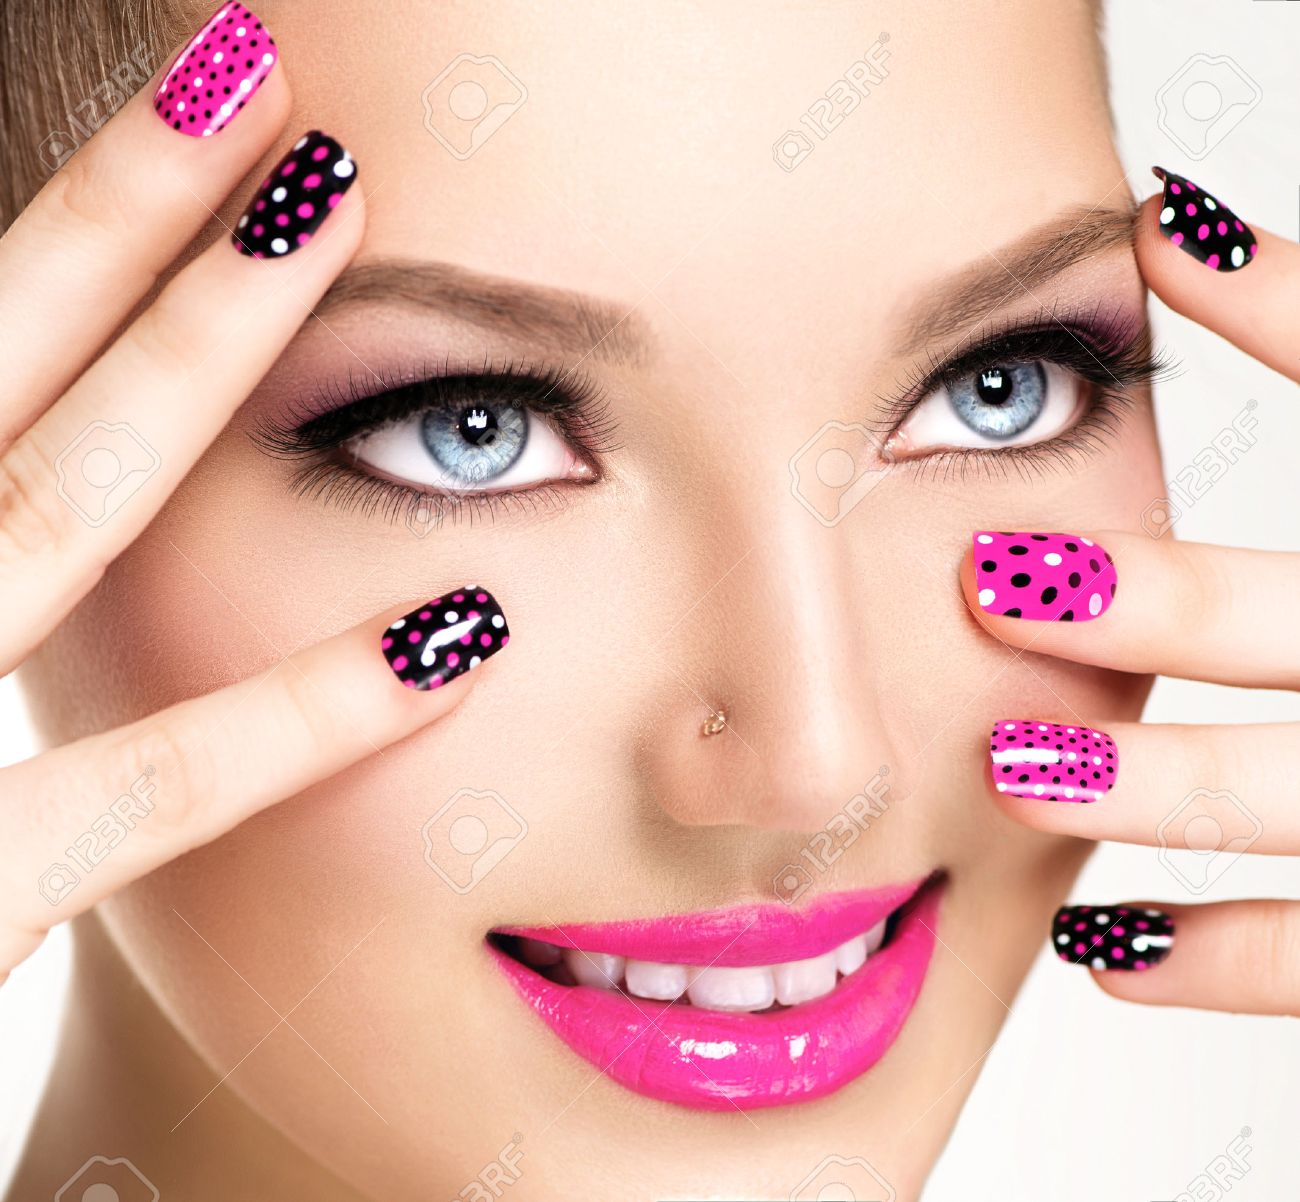 Woman portrait close up. Bright Colors. Manicure and makeup Stock Photo - 39944243